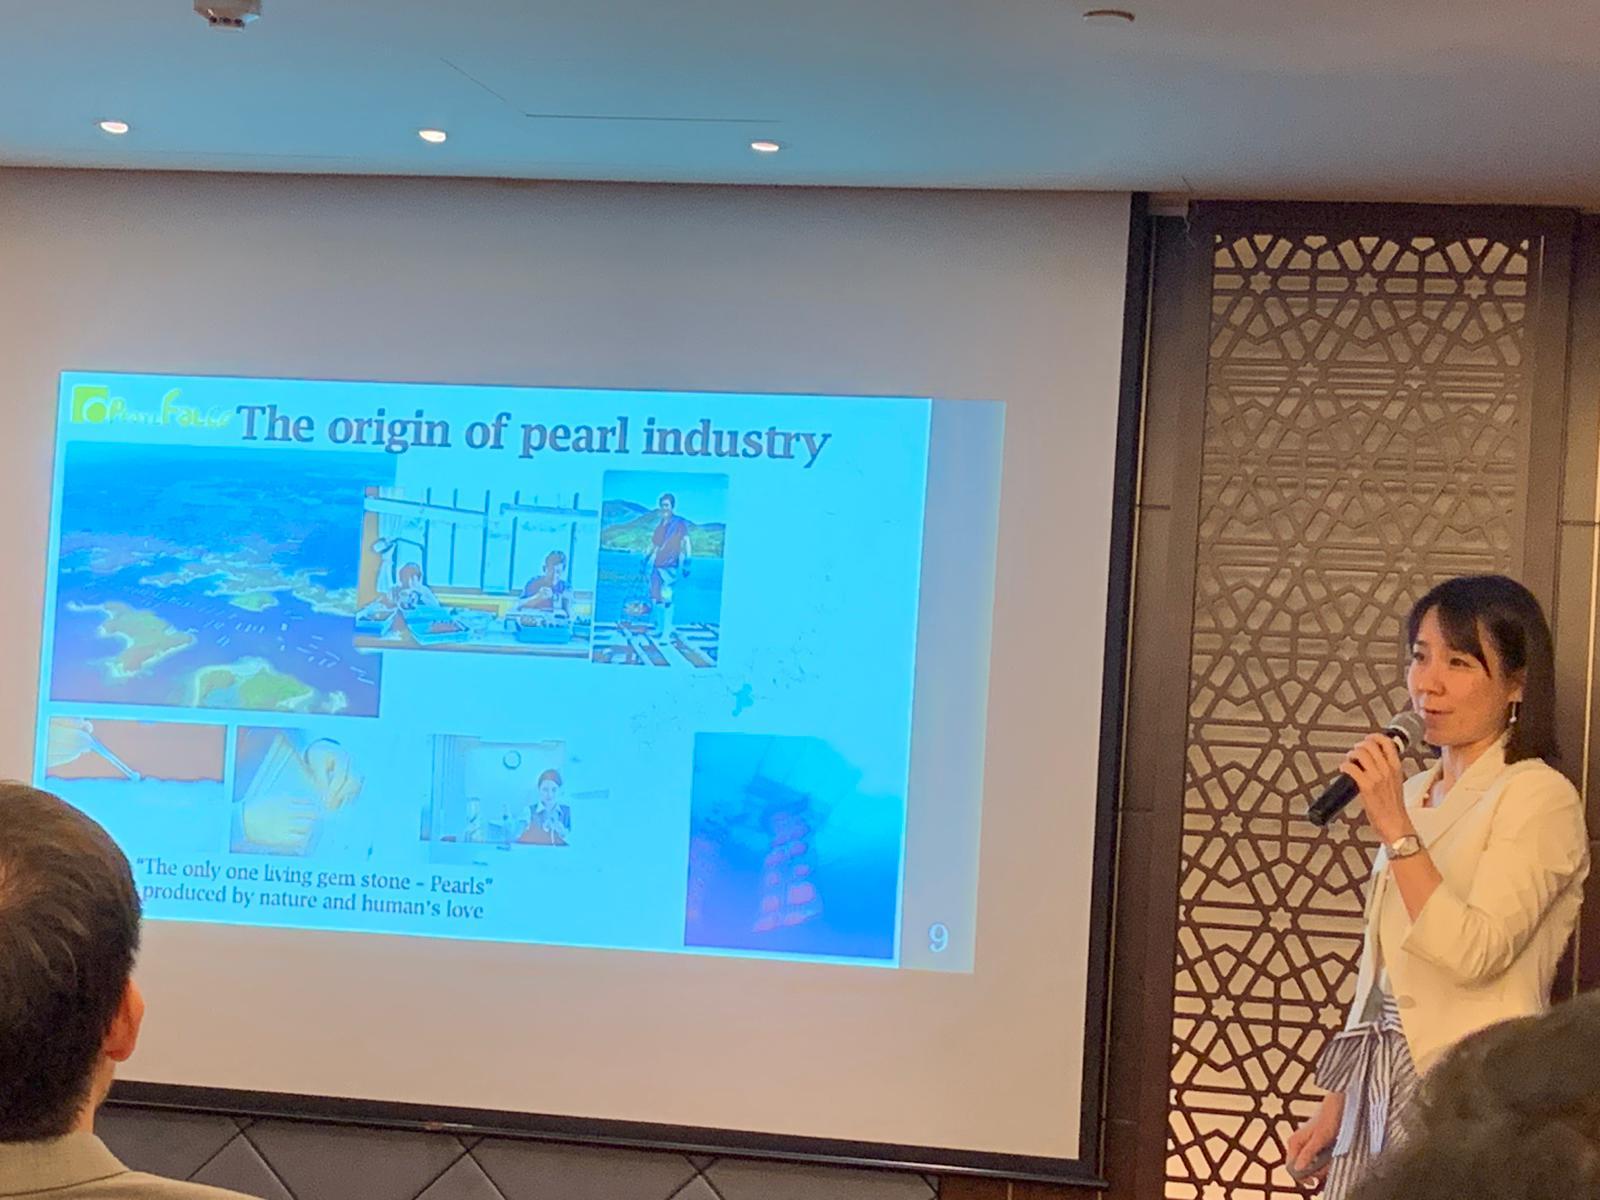 Pearl Talk in Asia / アジア各国で「真珠養殖発祥の地‐伊勢志摩」についてWorkshop開催